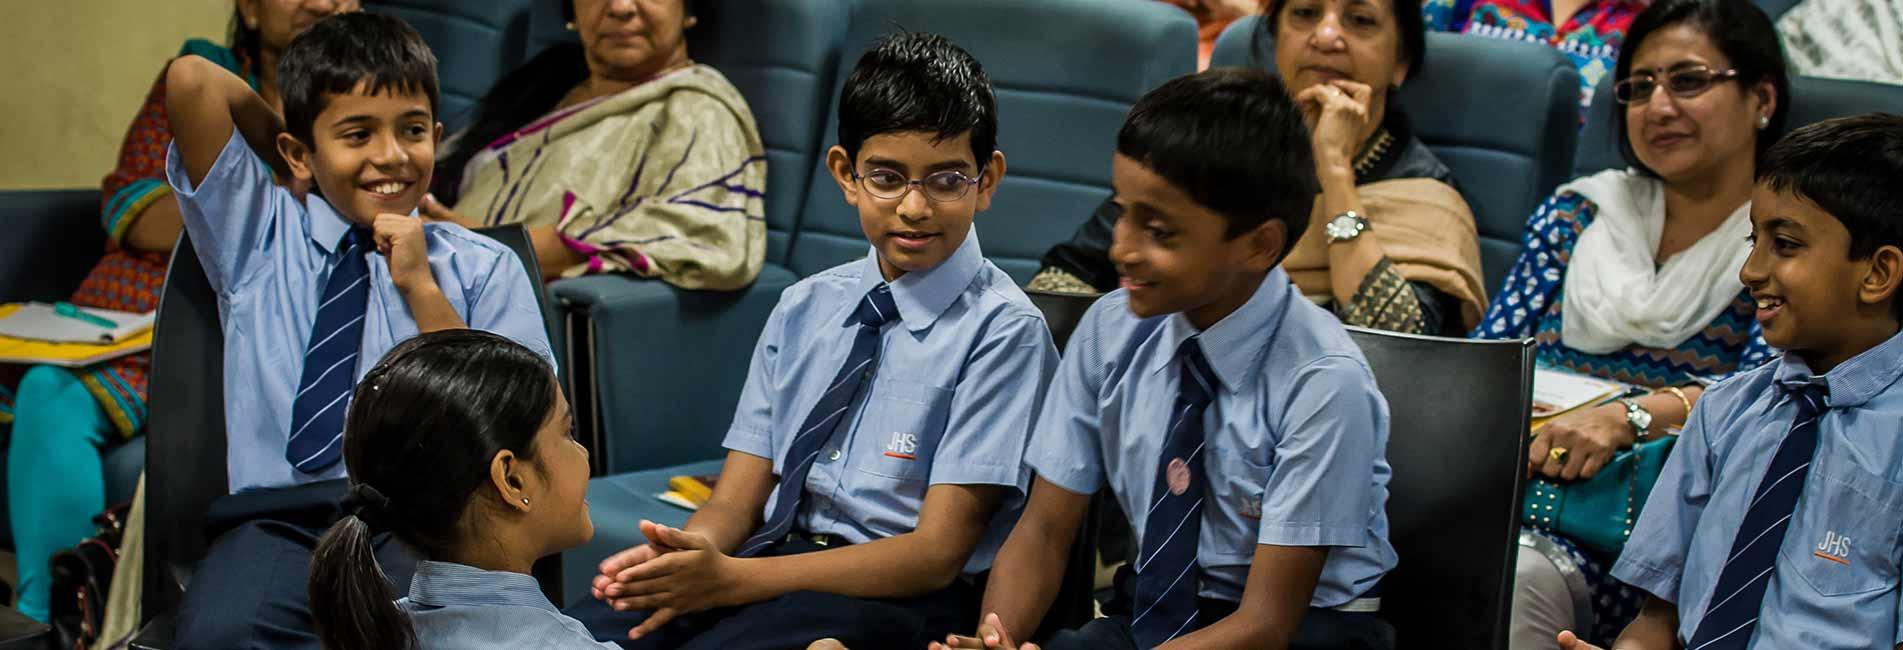 Cheerful classroom interactions